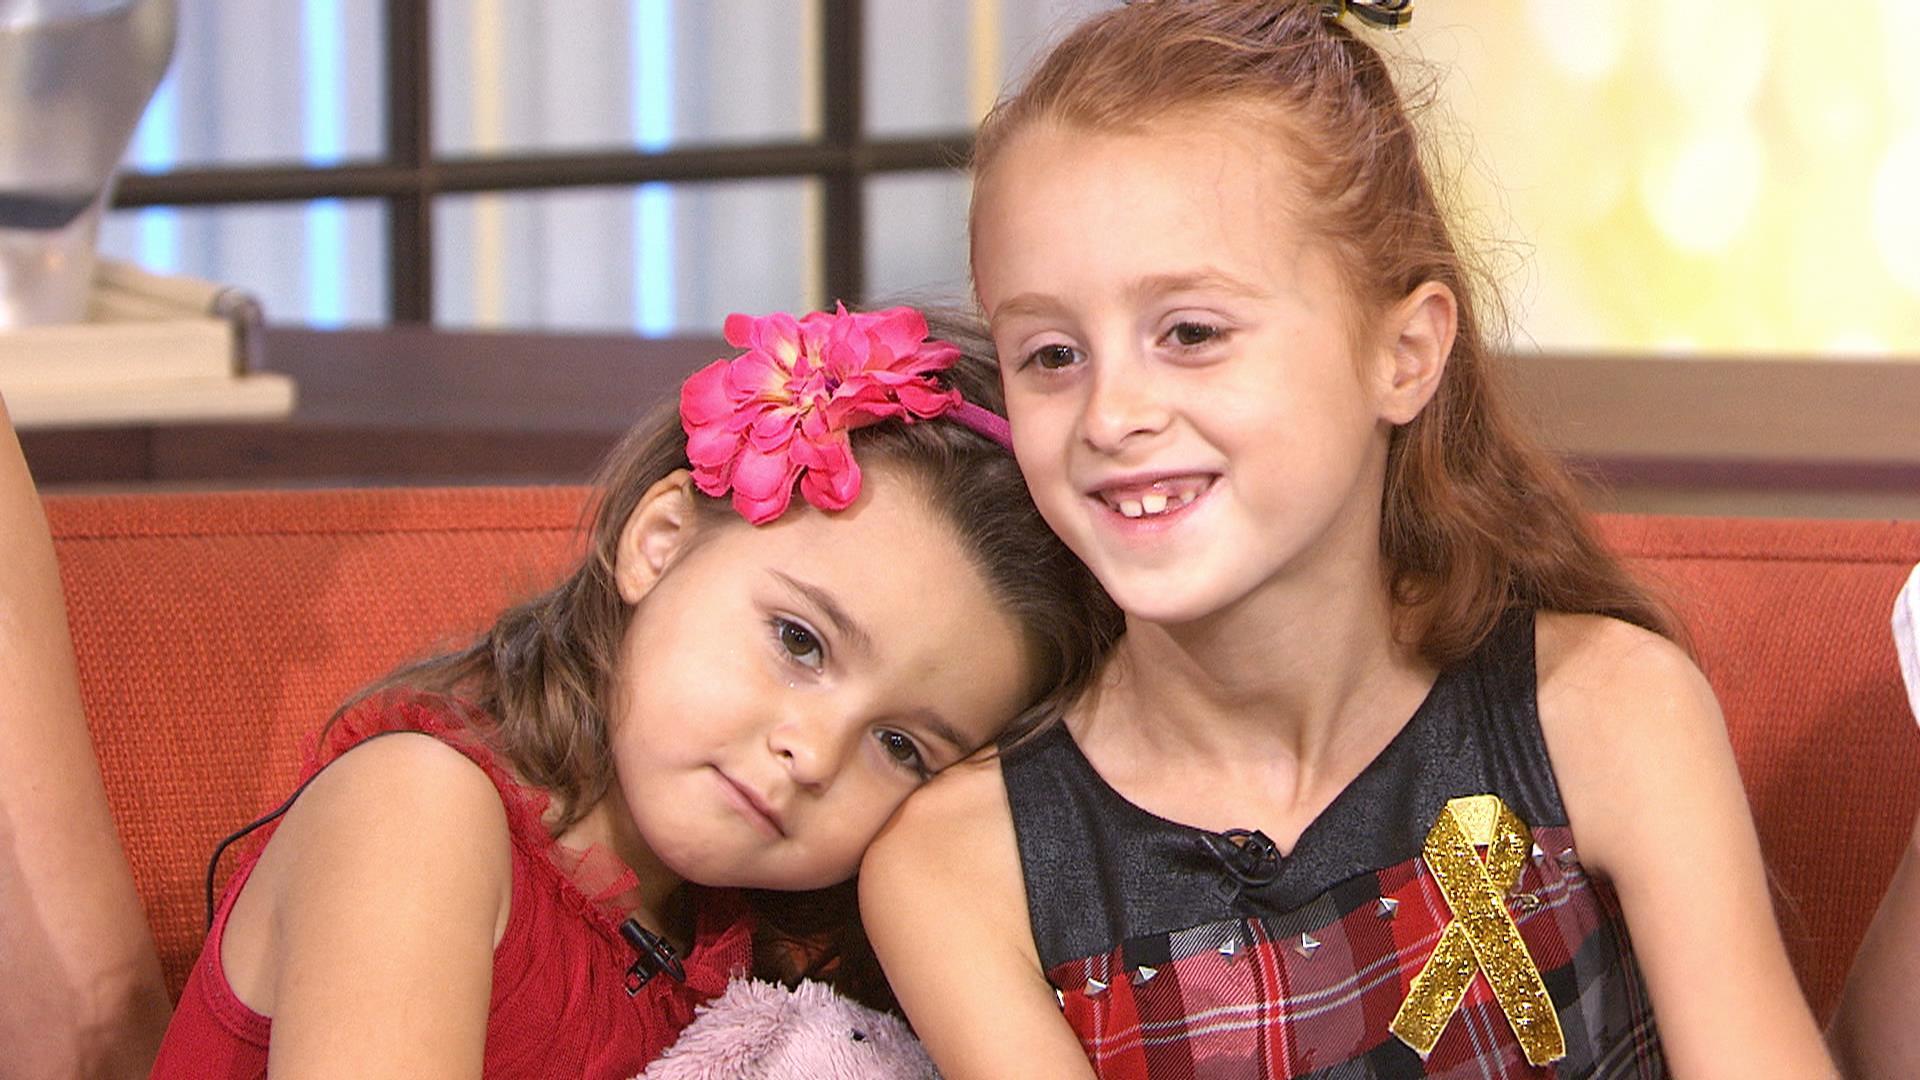 Family Raises Awareness for Pediatric Cancer